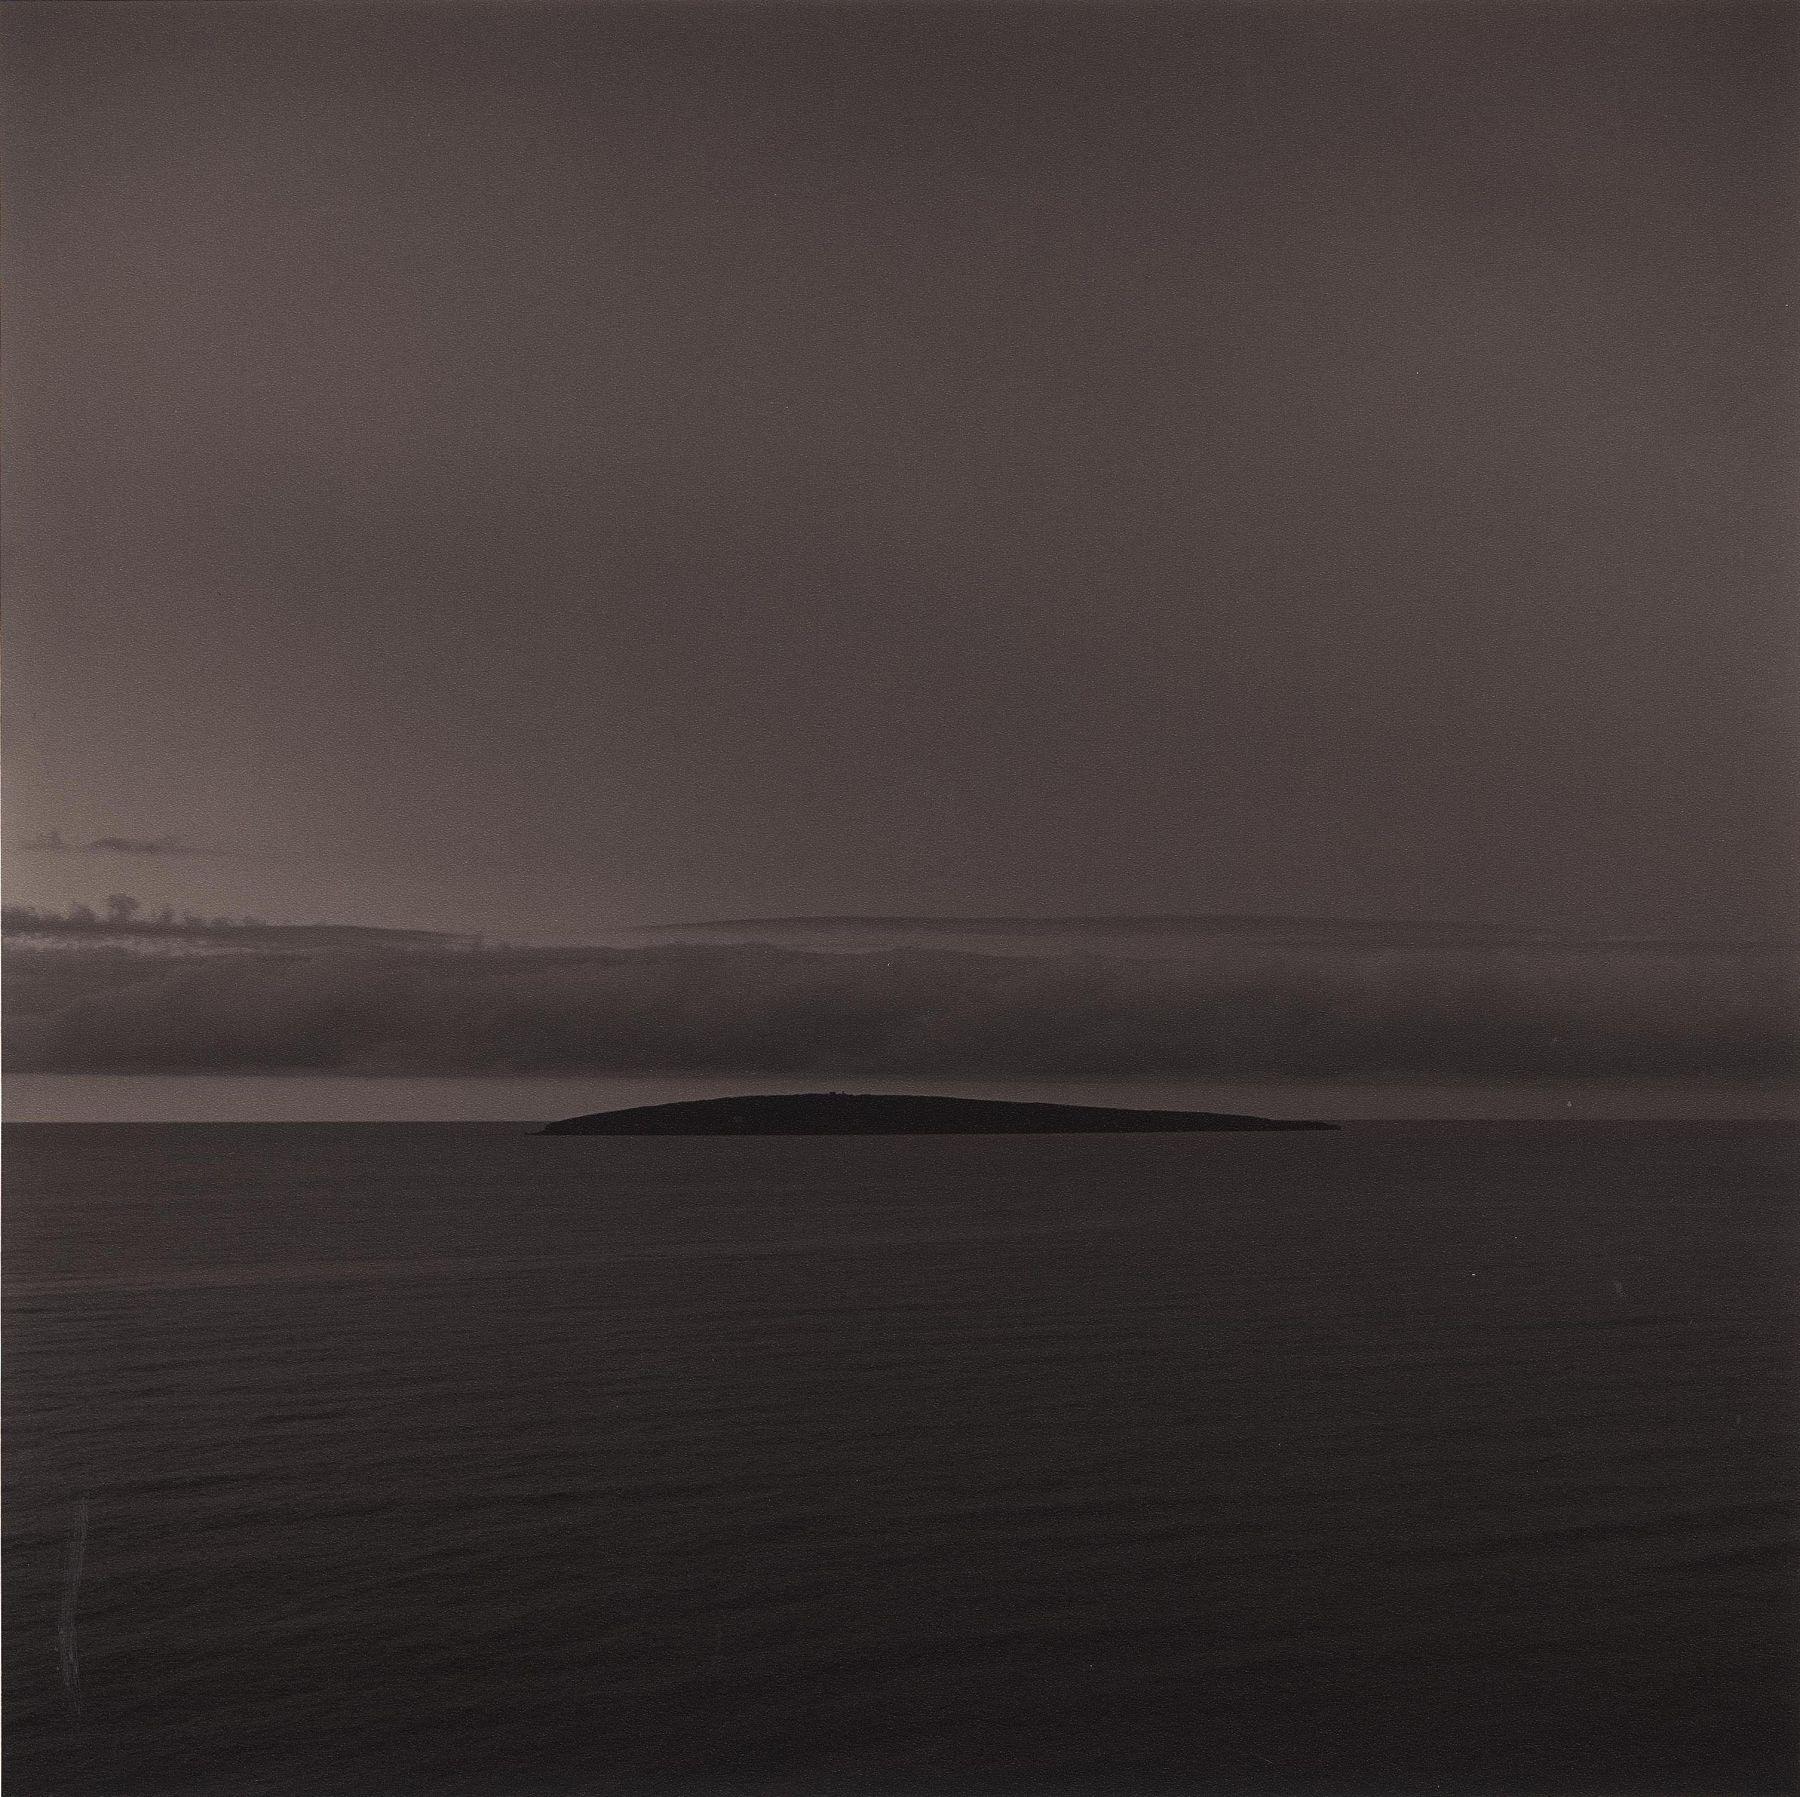 Lynn Davis, Evening/Northumberland Strait XIII, 1995